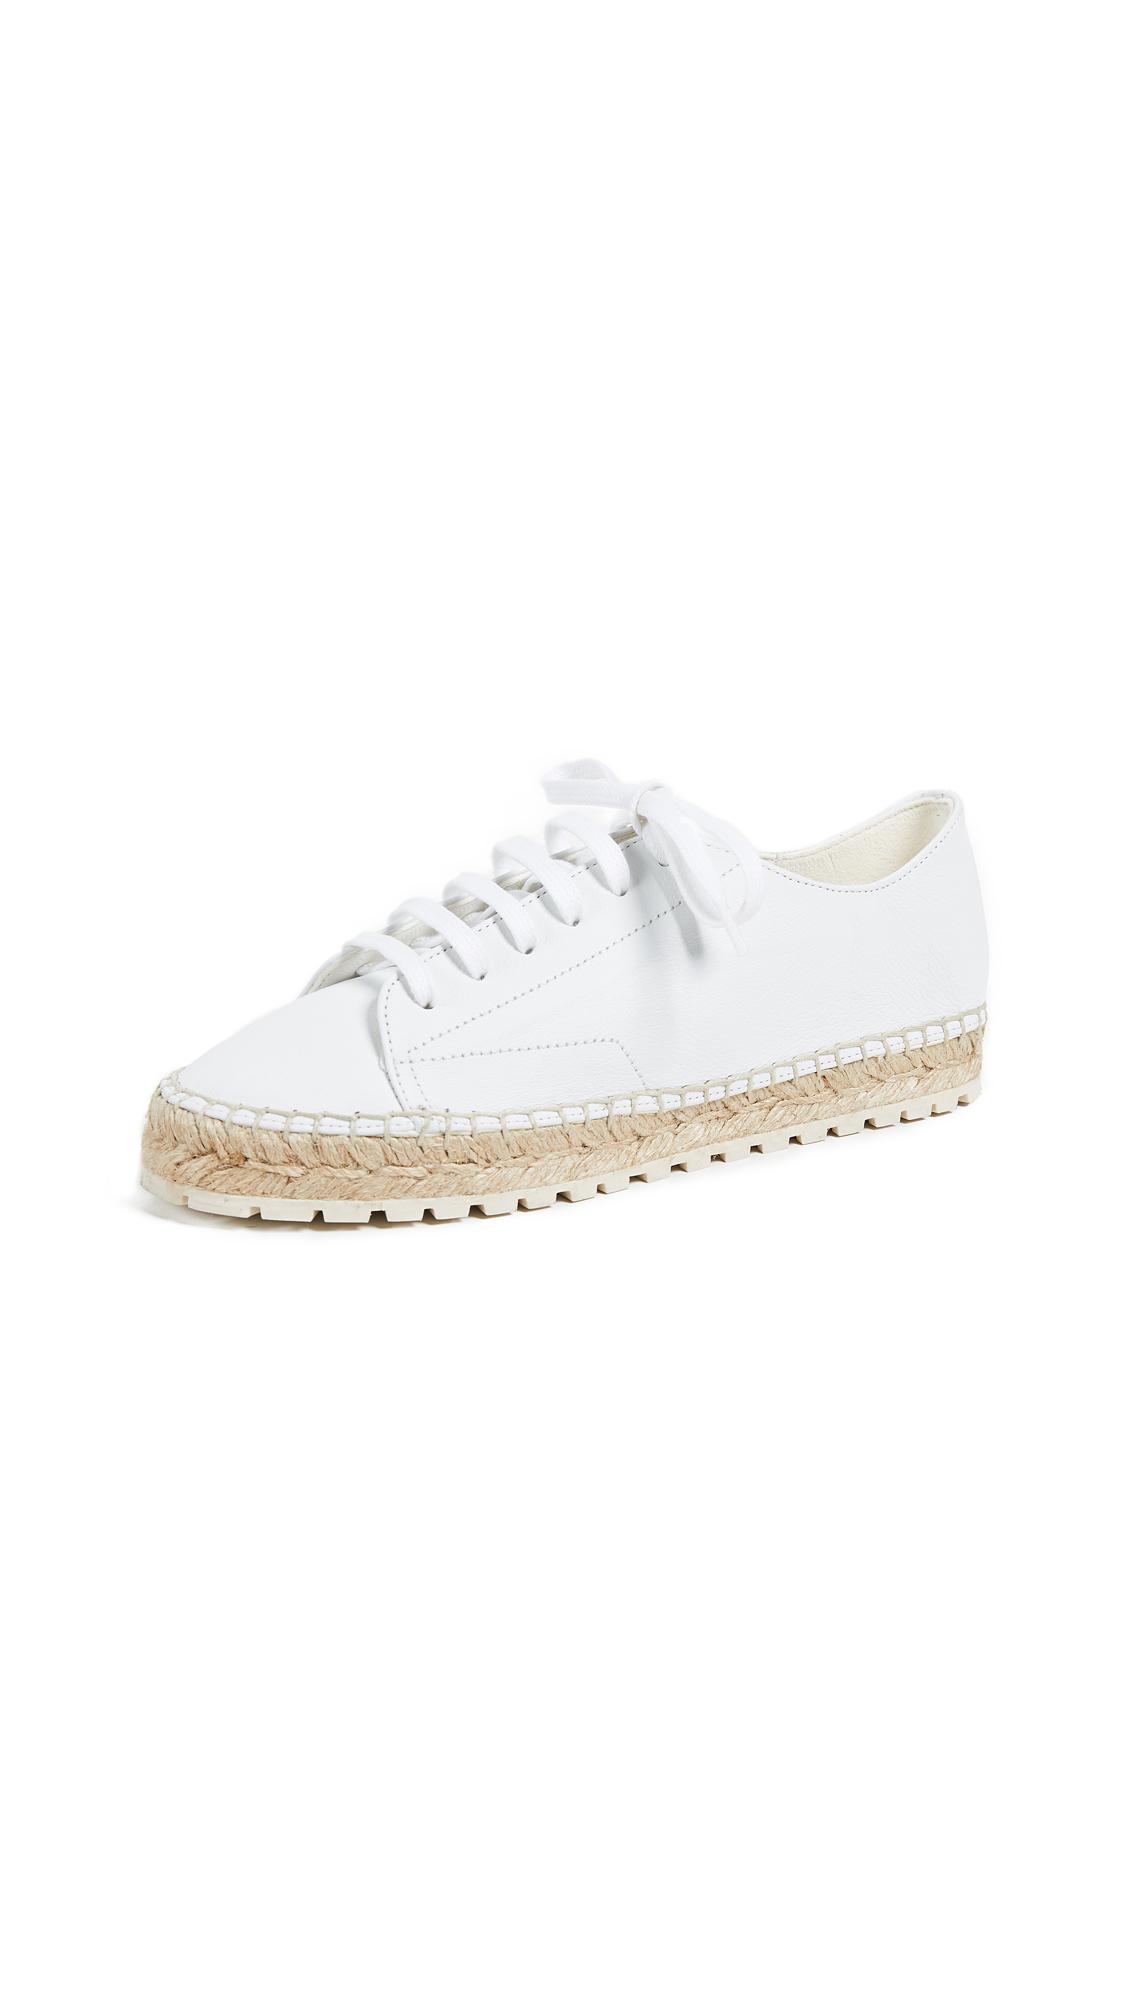 Paloma Barcelo Erino Espadrille Sneakers In White